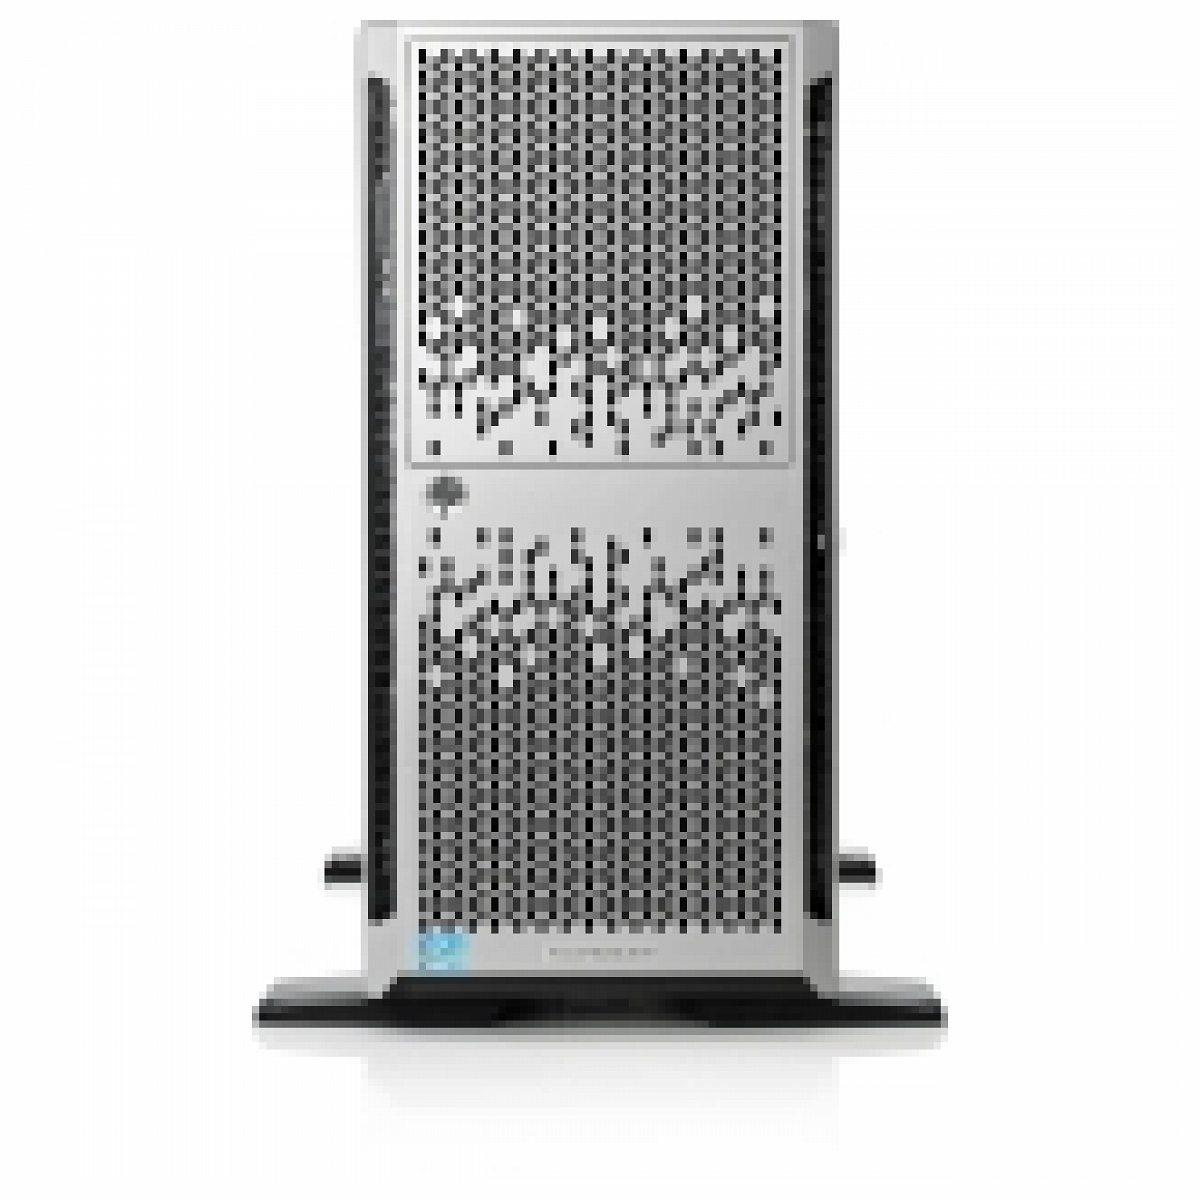 HPE 736984-S01 HP ProLiant ML350p Gen8 E5-2620v2 2.1GHz 6-core 1P 8GB-R P42